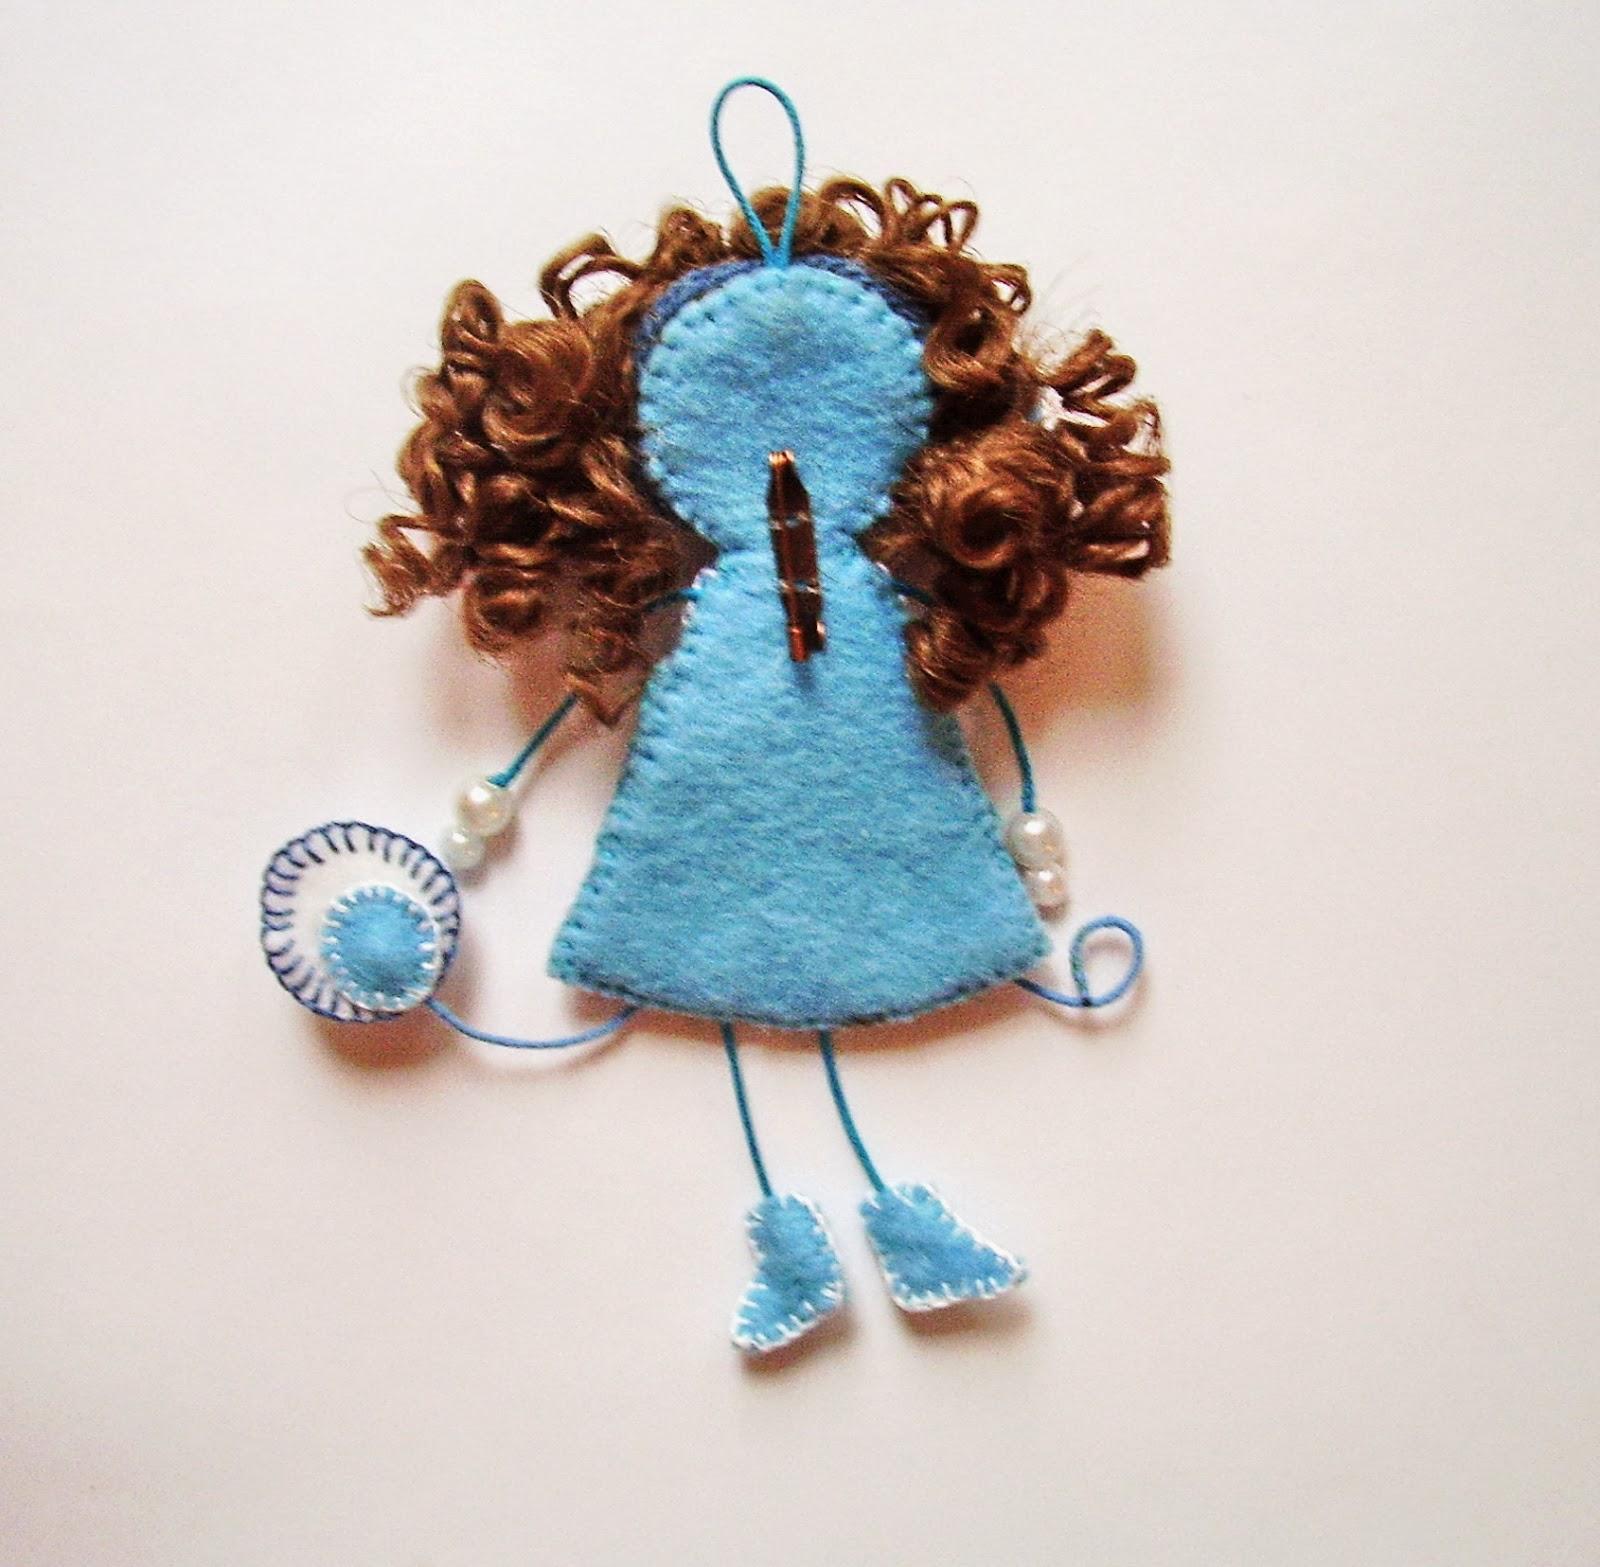 Игра в куколки шьём мягкие брошки из фетра Ярмарка 6